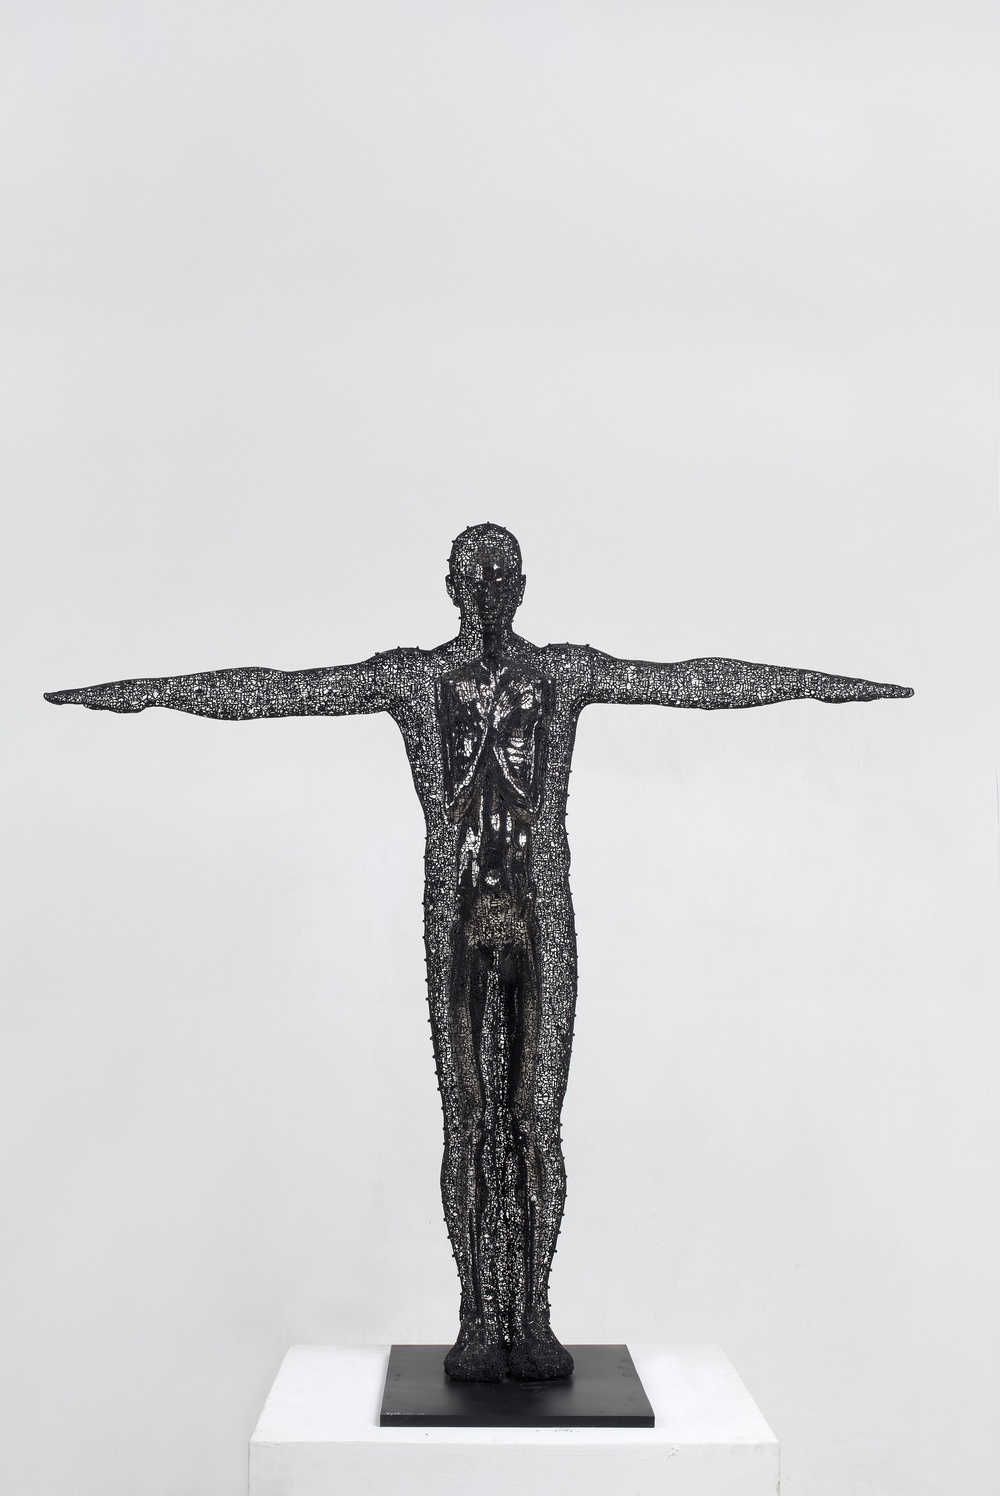 Zheng Lu 郑路, Myself 知己, 2012, Stainless steel and metal 不锈钢、铁, 139 x 53 x 140 cm